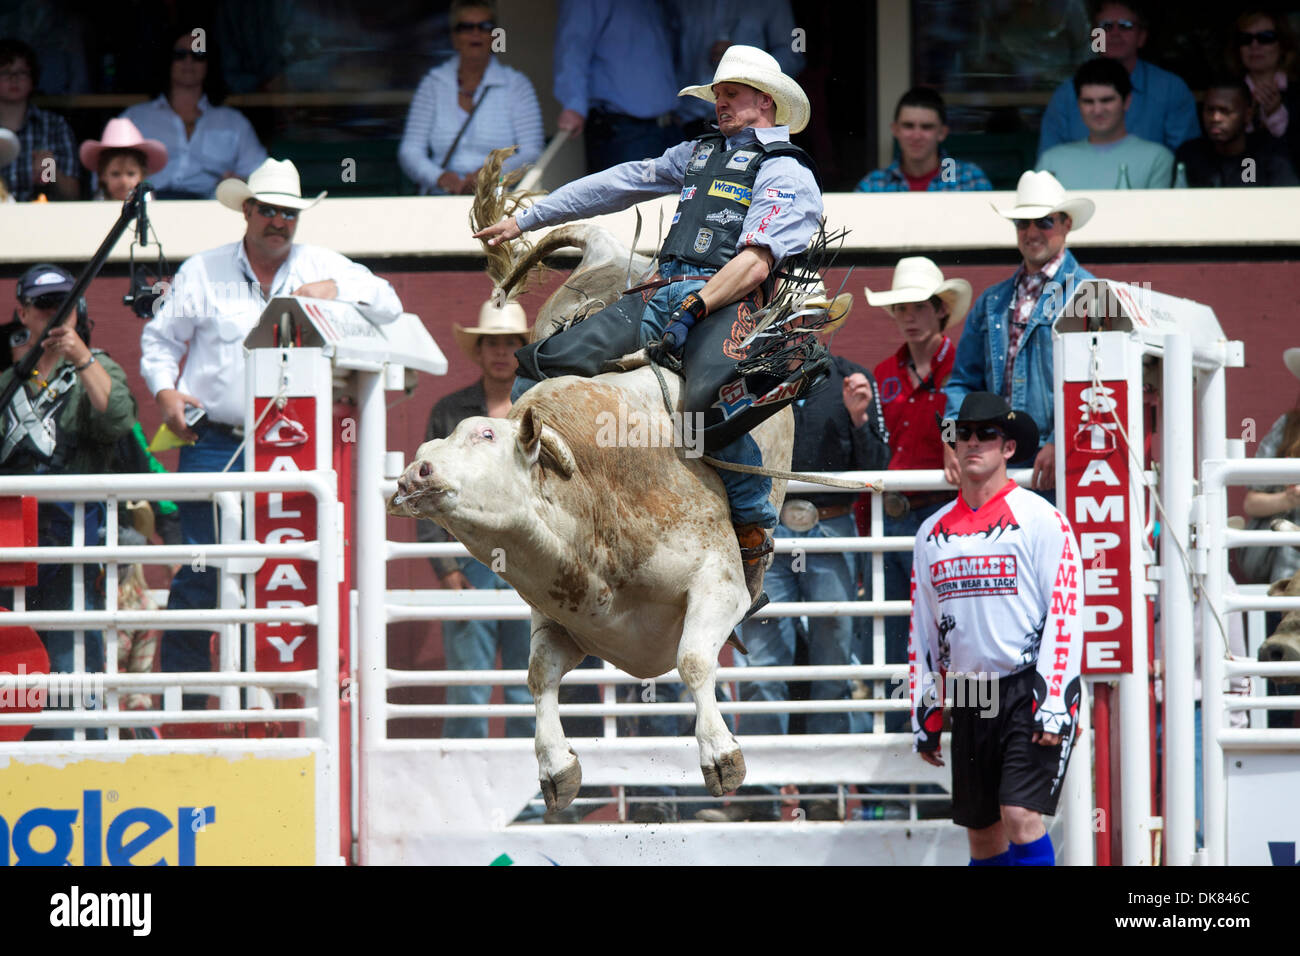 9 Juli 2011 Reitet Calgary Alberta Kanada Bull